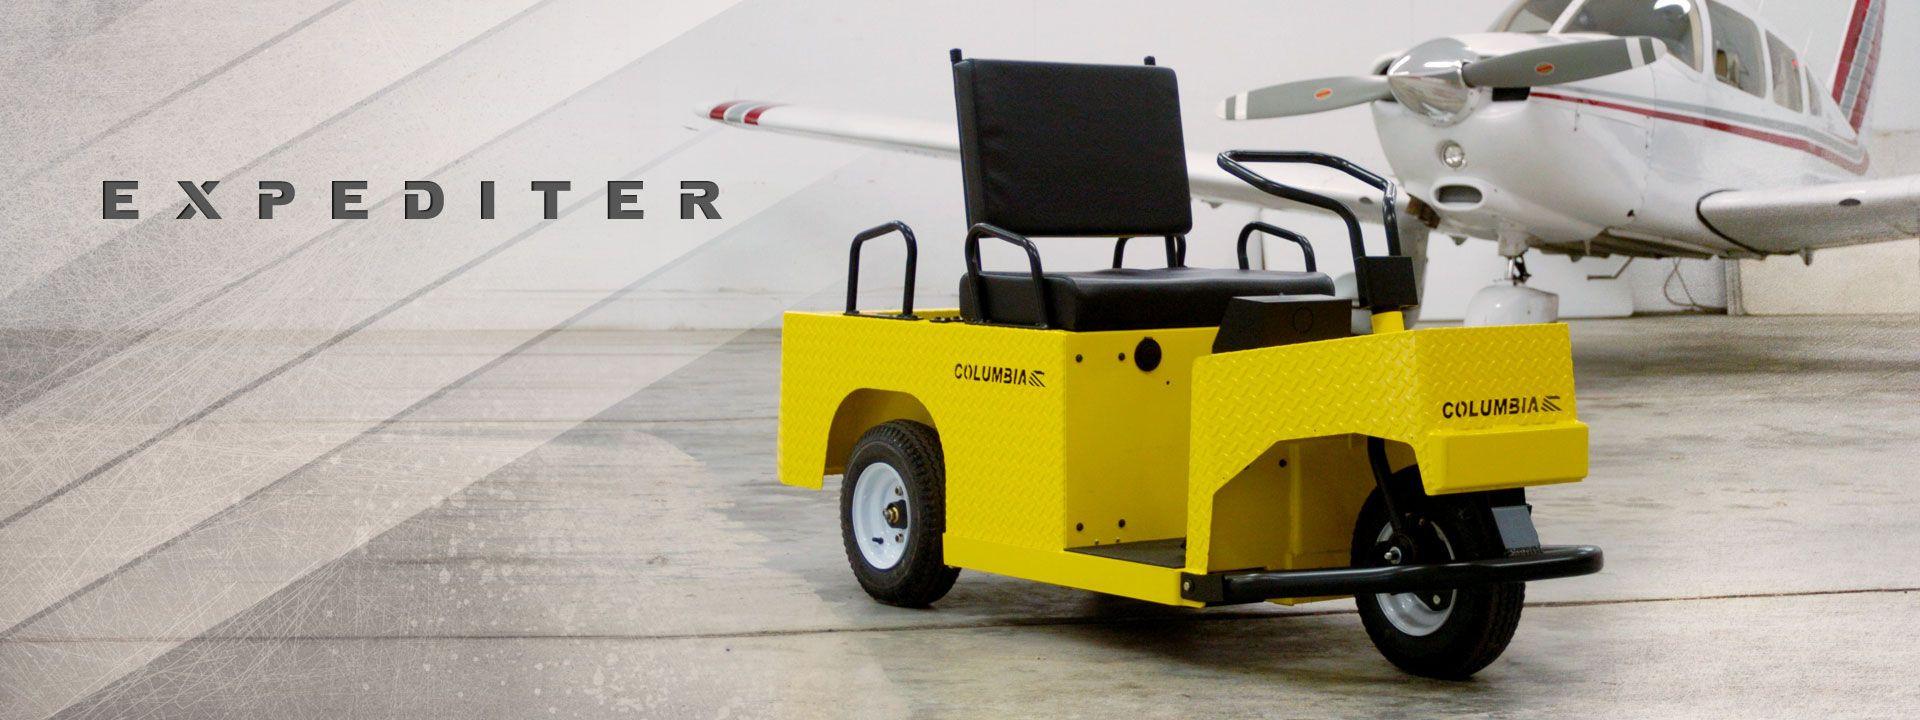 Yellow Columbia Expediter